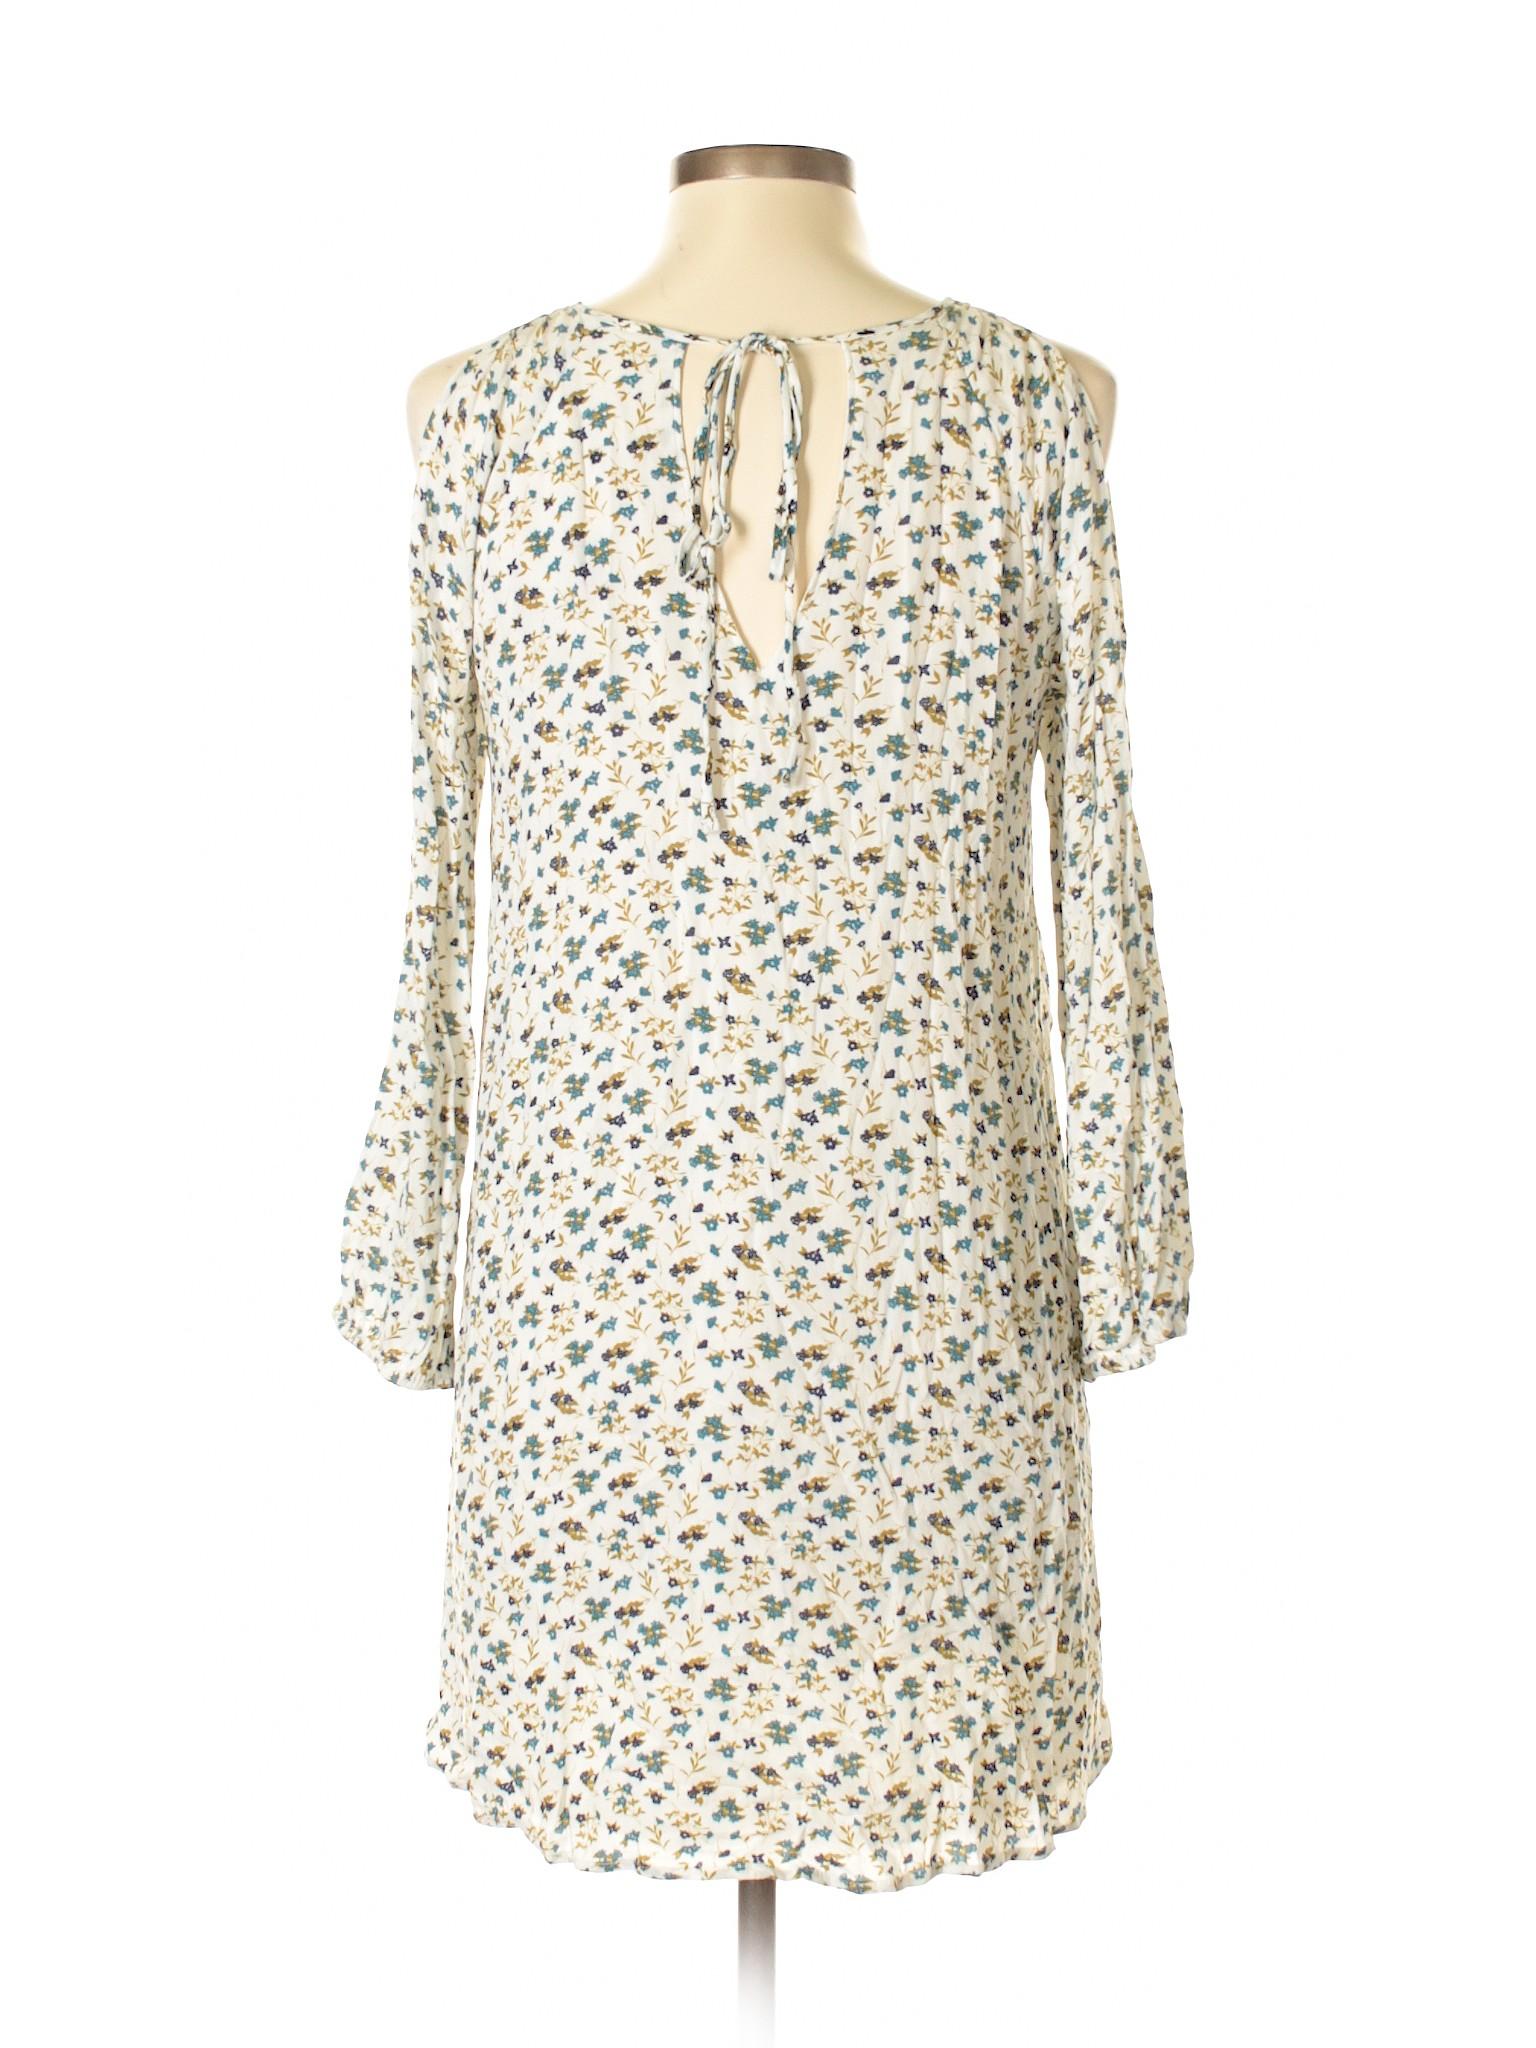 Old Dress Navy winter Boutique Casual YWqB5n1ww